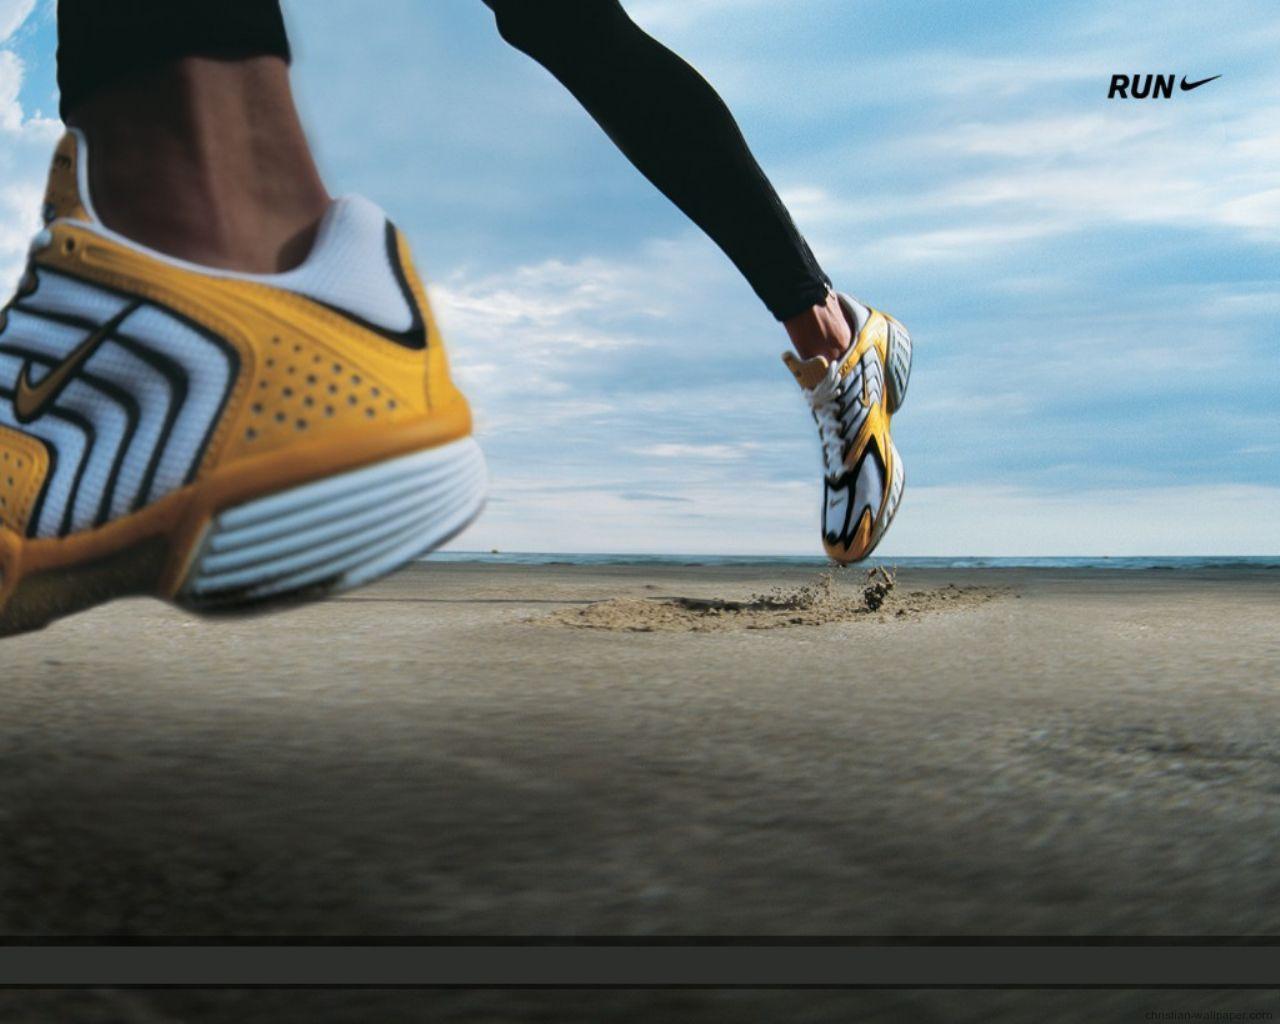 Sport Running Wallpaper Hd: Running Wallpapers Desktop